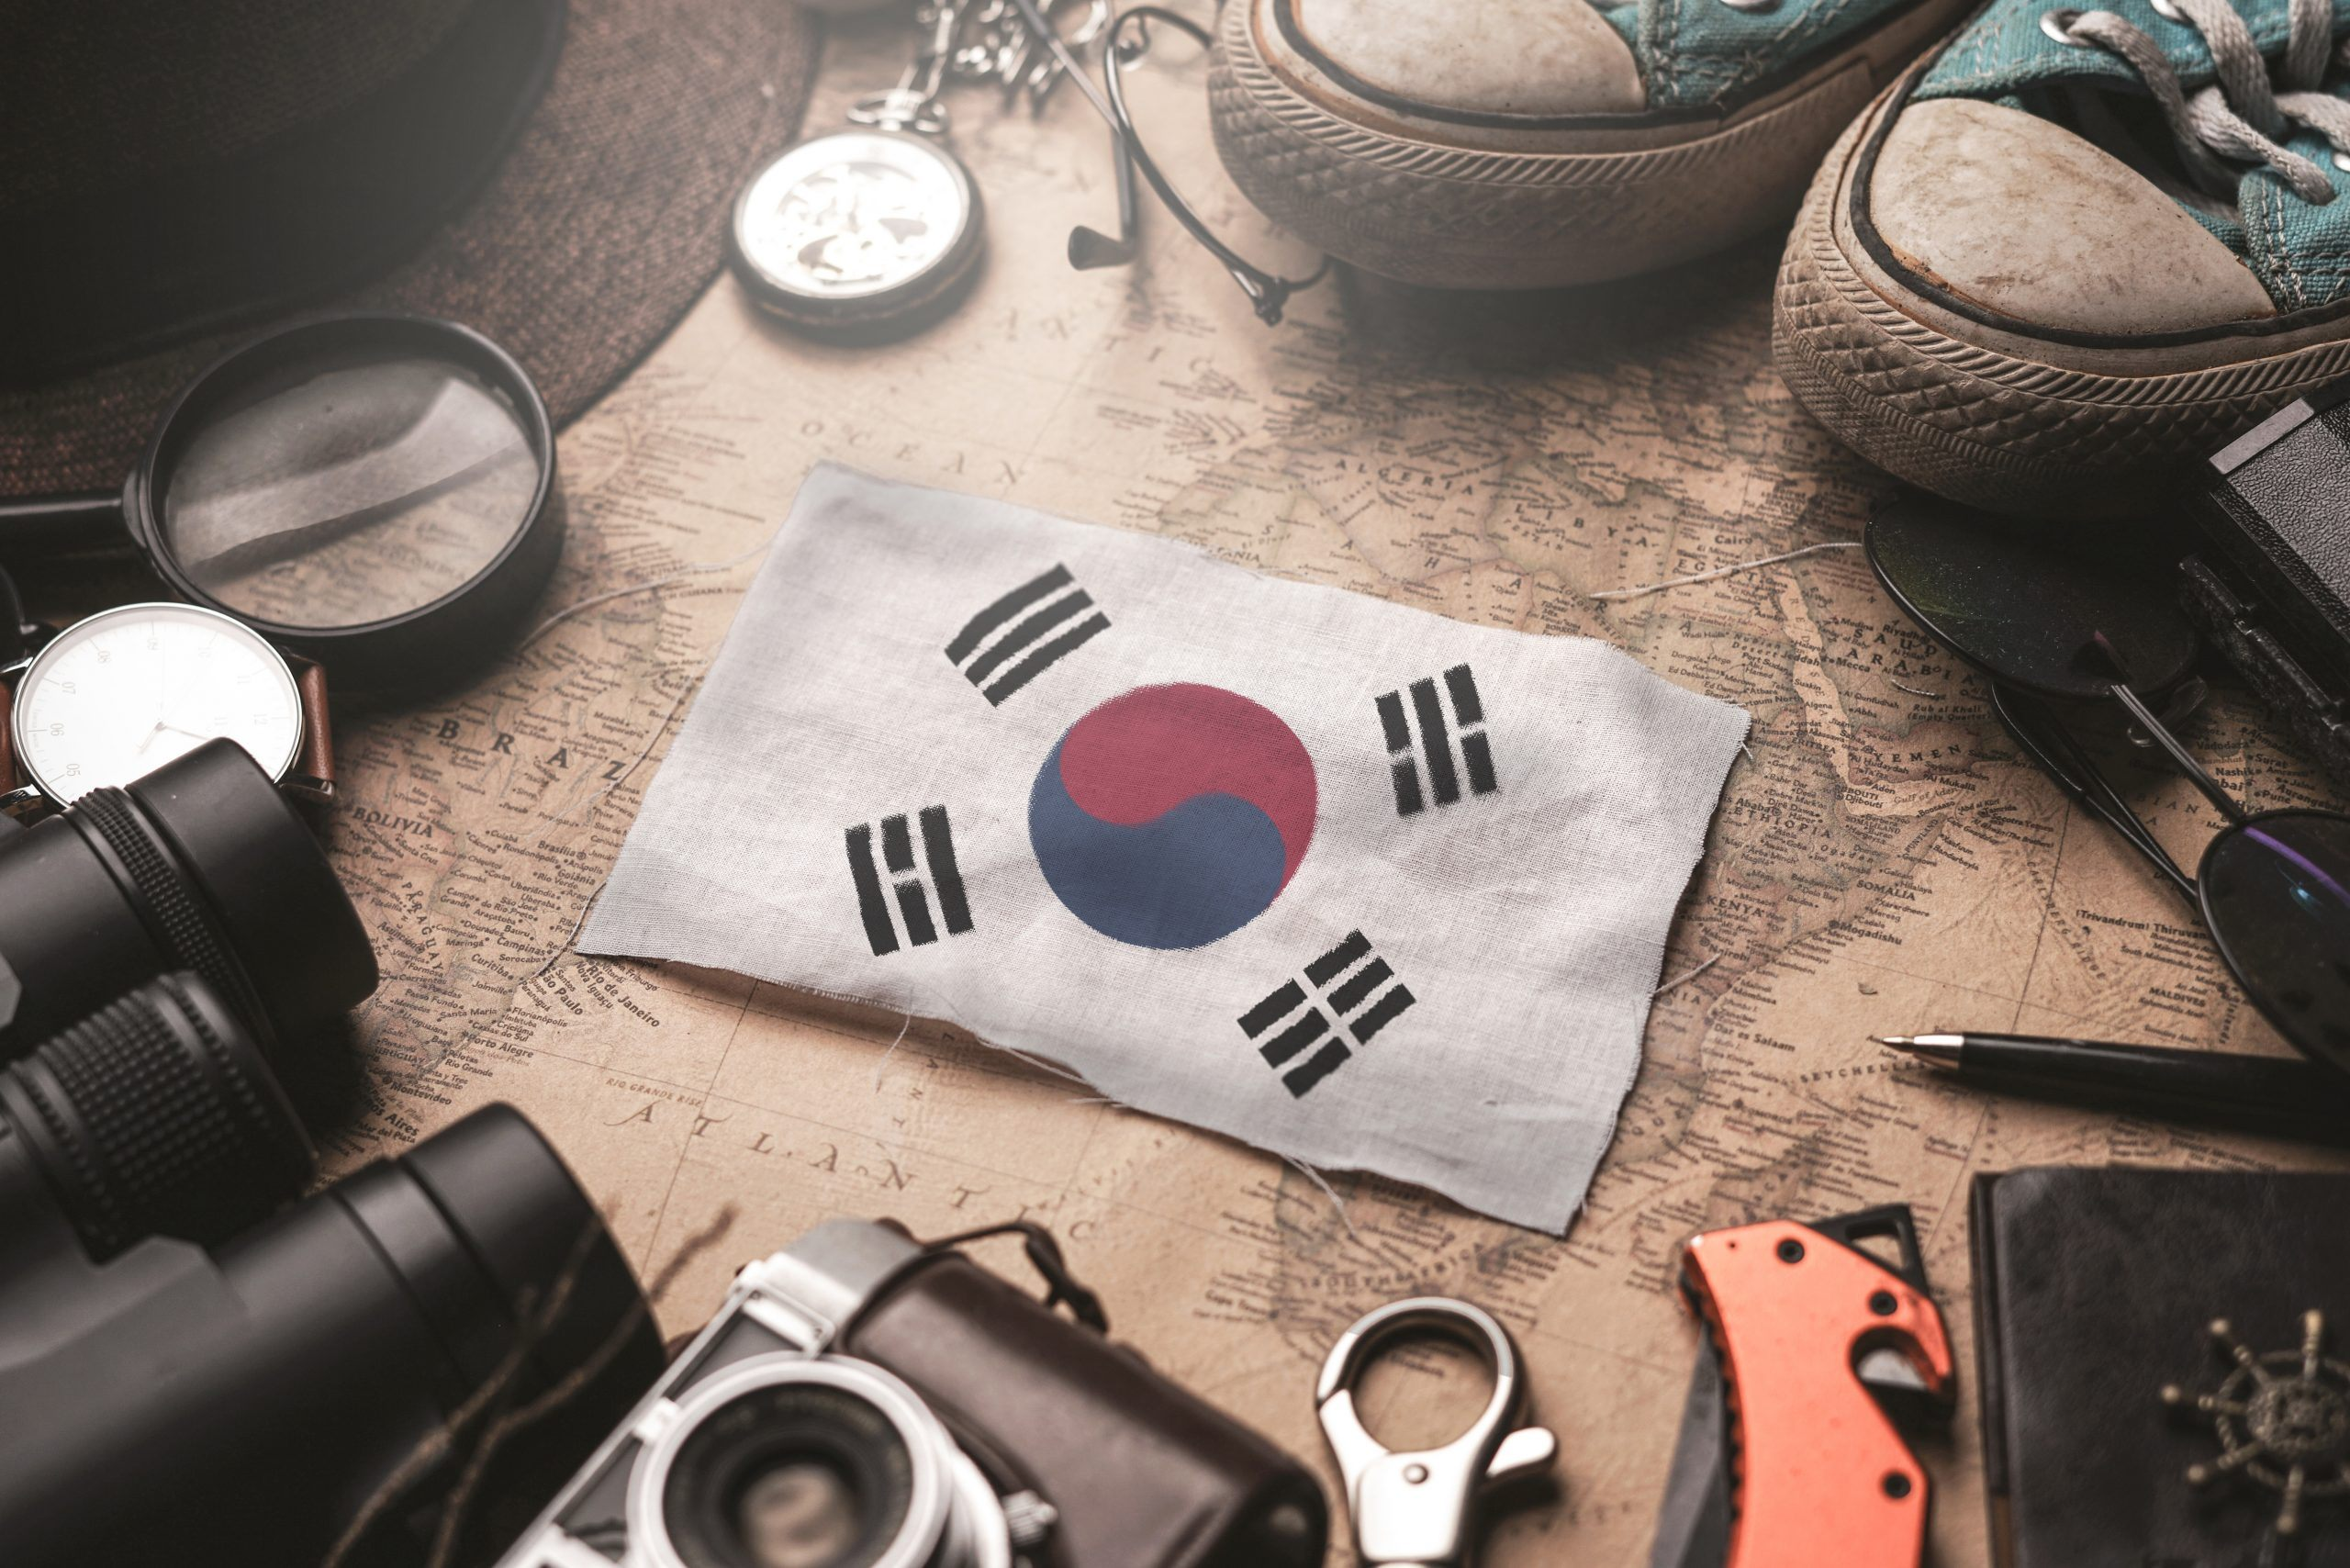 South Korea Flag Between Traveler's Accessories on Old Vintage Map. Tourist Destination Concept.